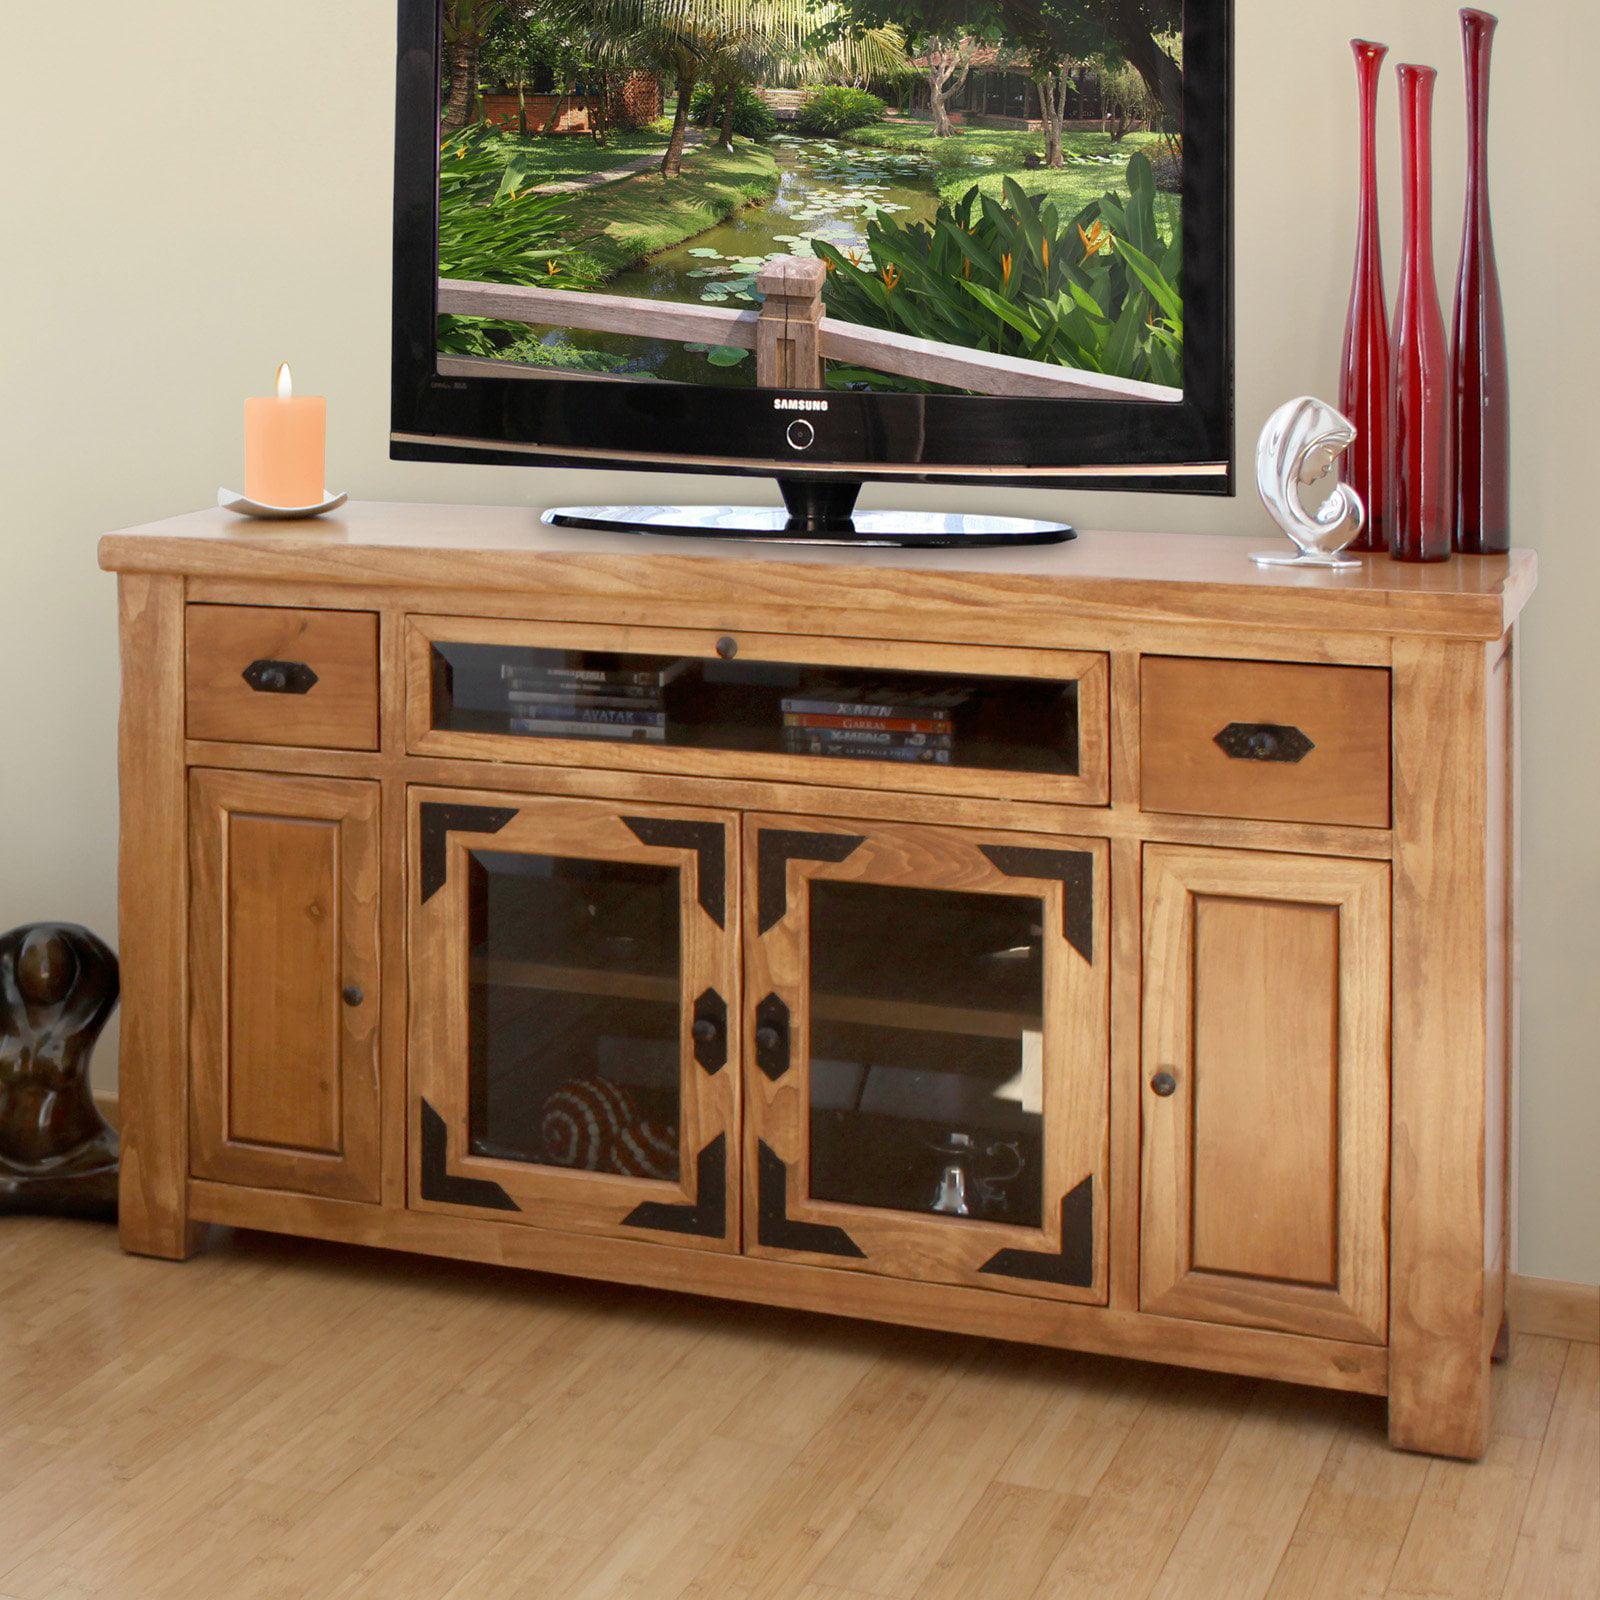 Artisan Home Furniture Lodge 62 in TV Console Walmart